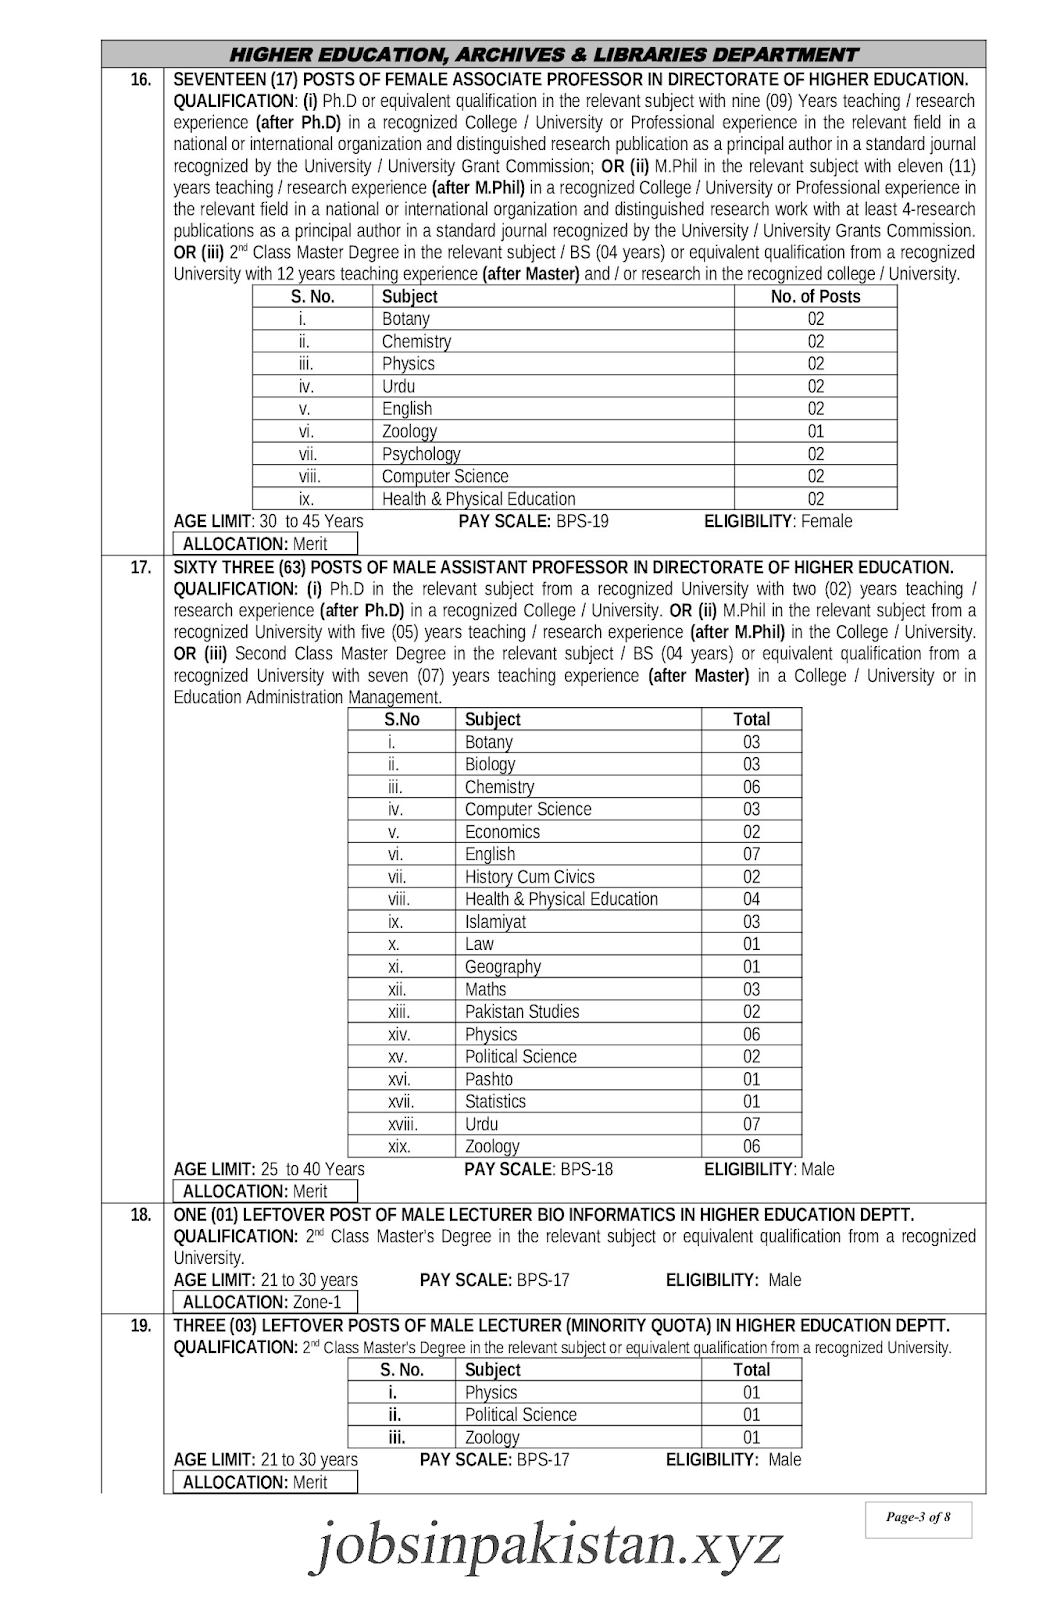 KPPSC Advertisement 08/2018 Page No. 3/8